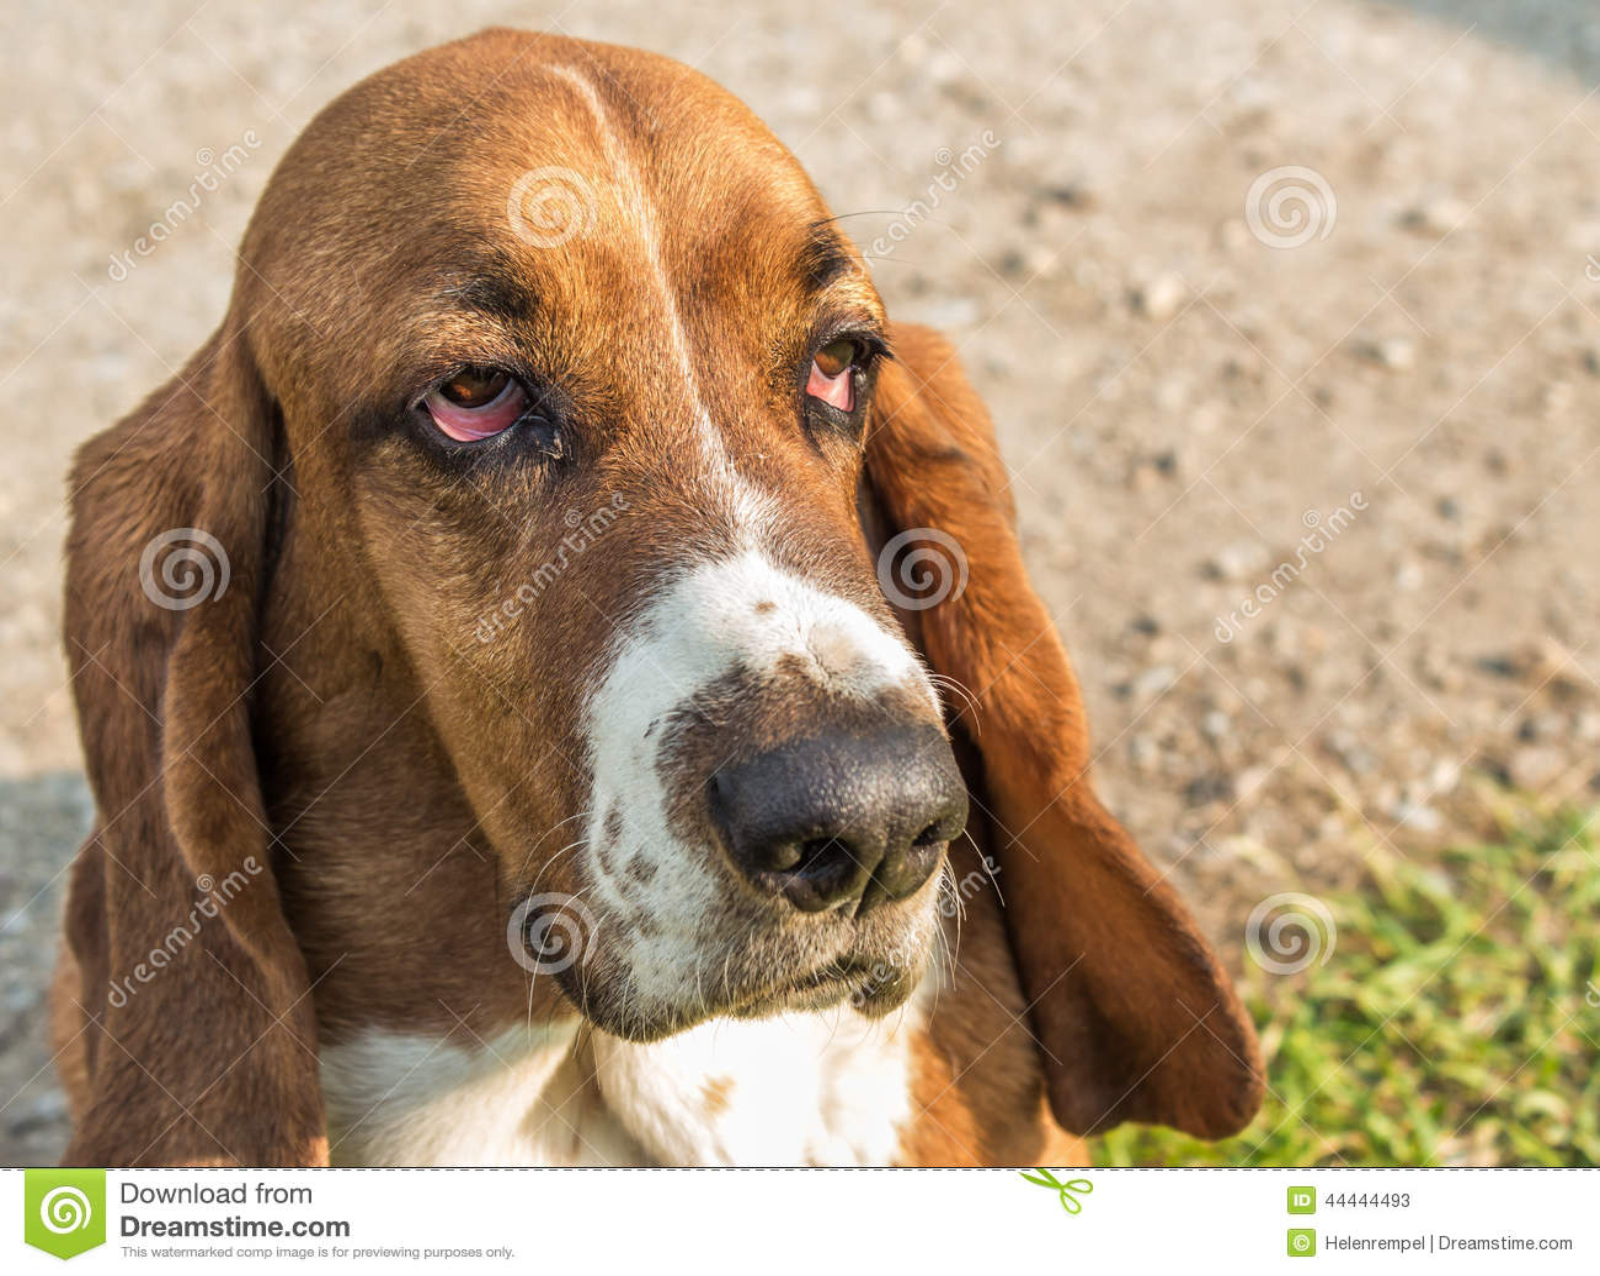 Face Shot Of A Basset Hound Stock Photo - Image: 44444493